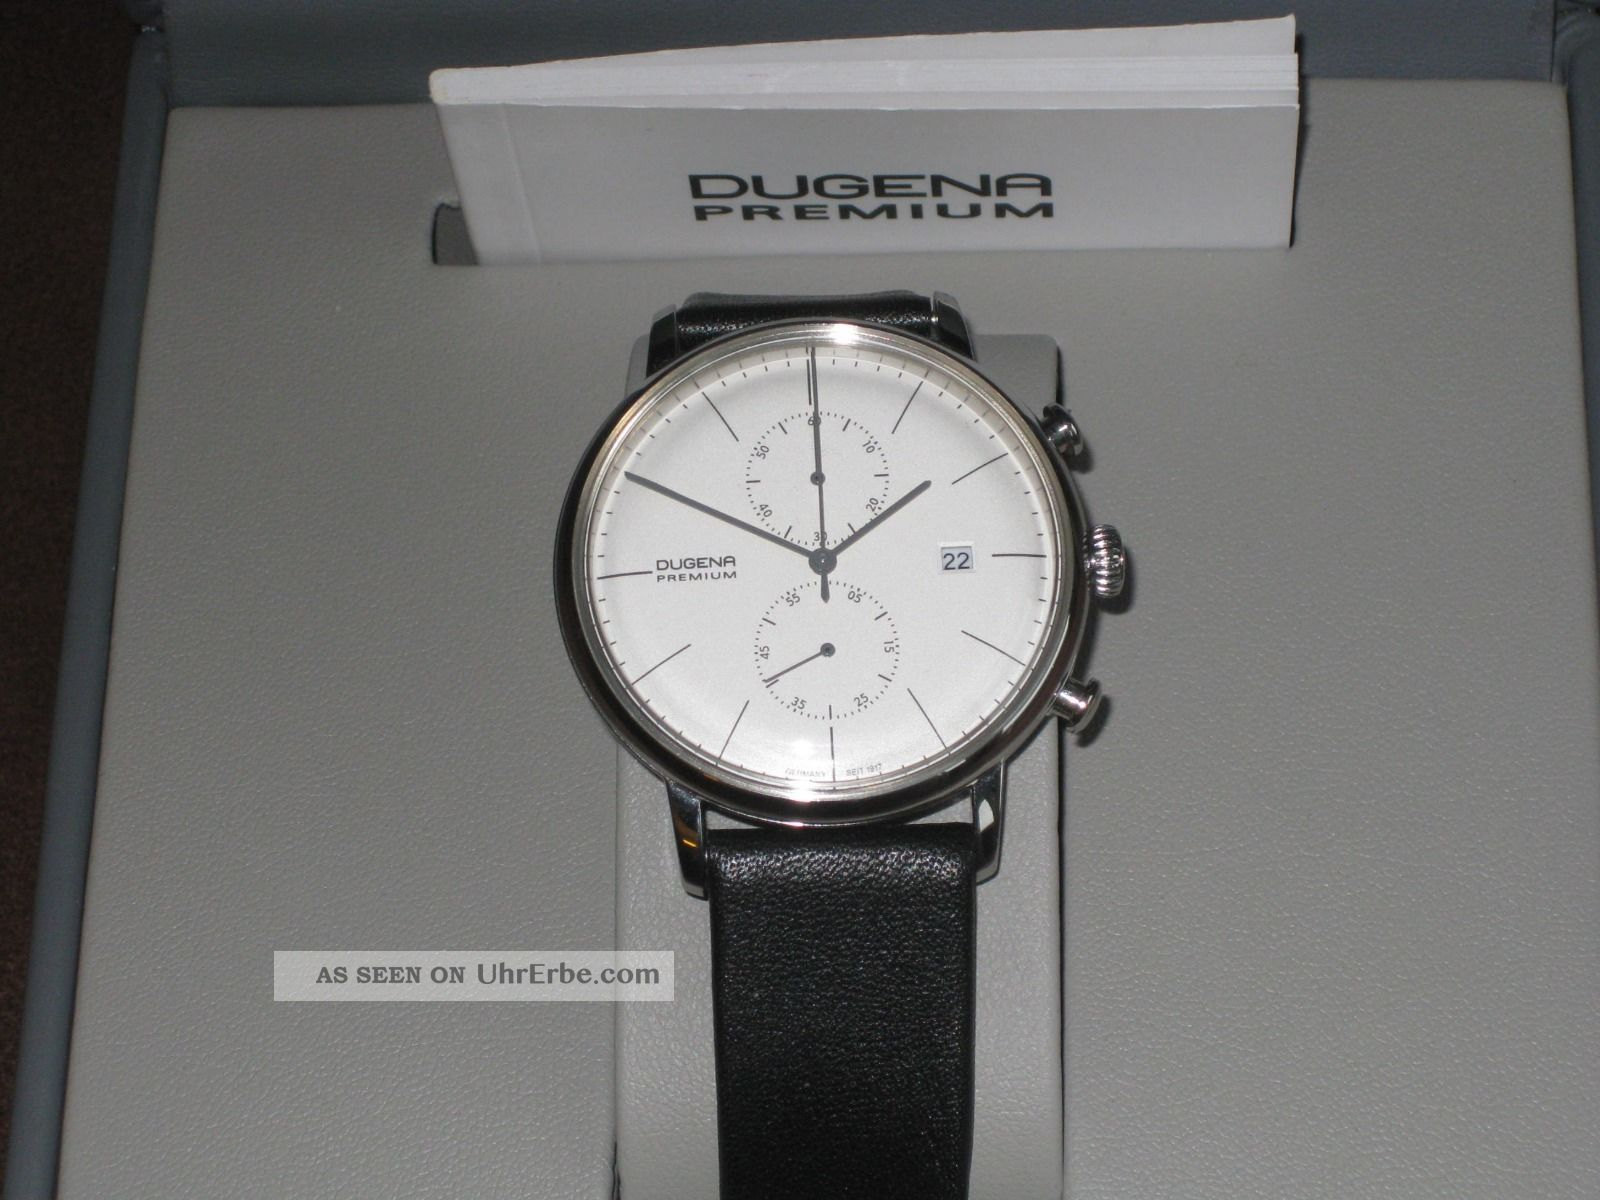 Dugena Premium Chrono Armbanduhren Bild